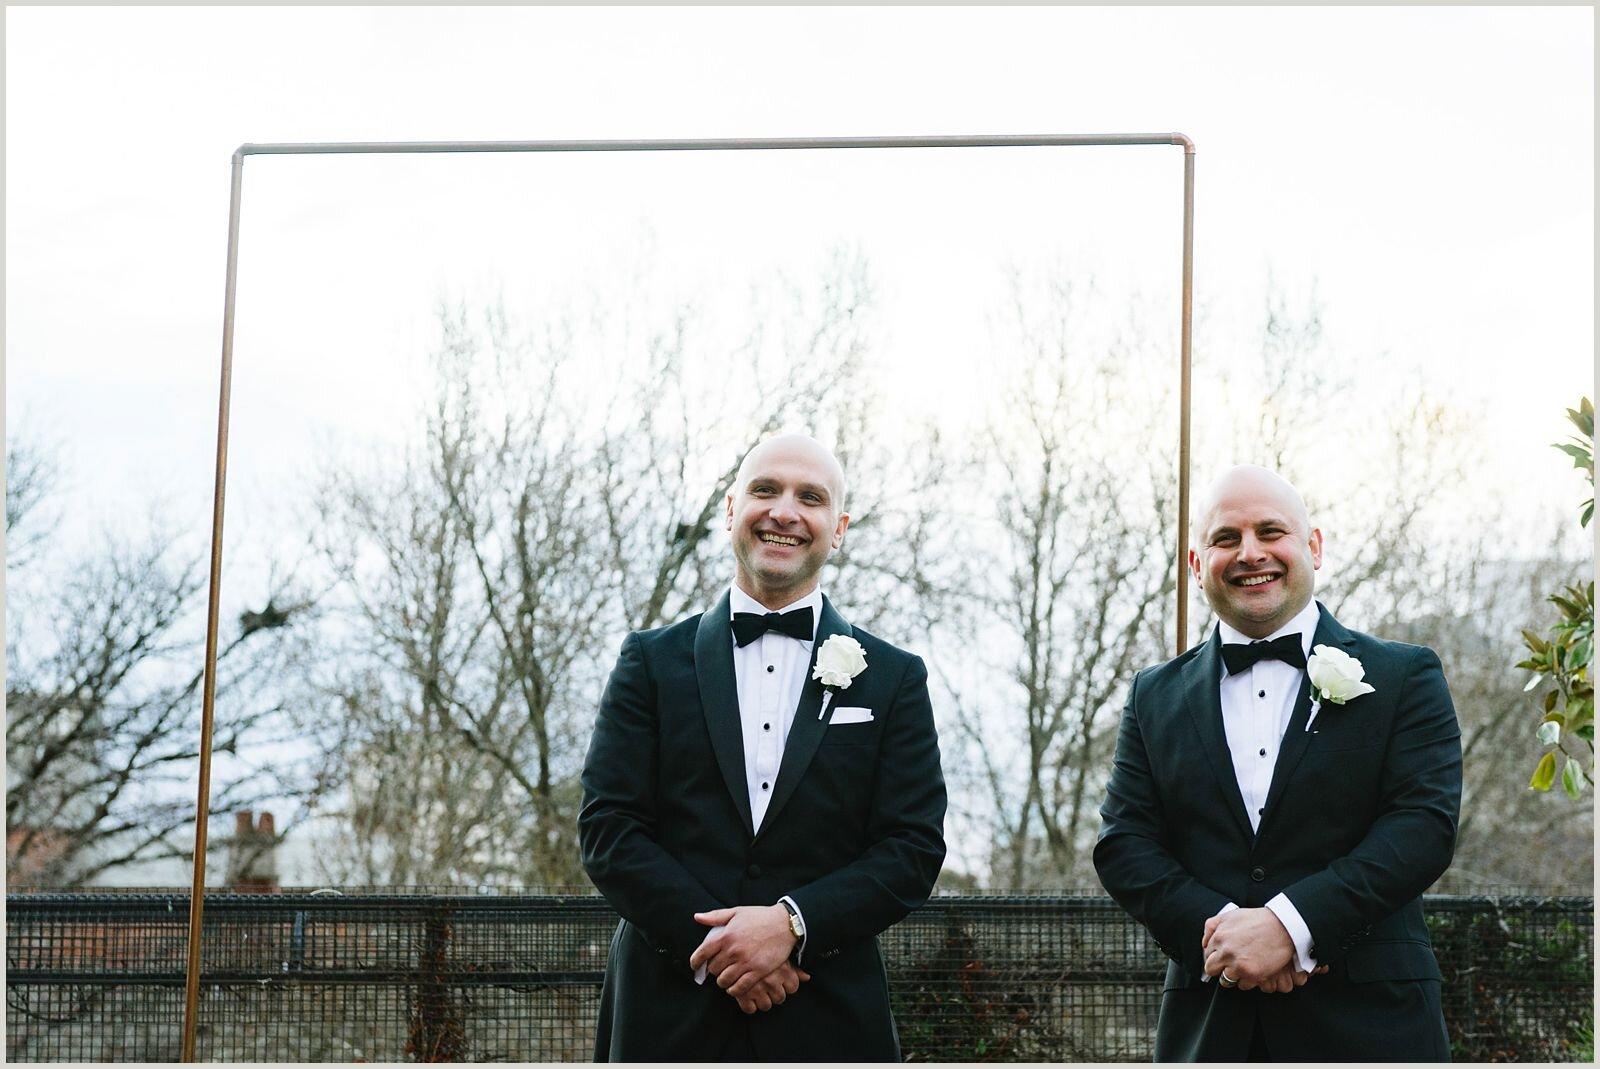 joseph_koprek_wedding_melbourne_the_prince_deck_0048.jpg